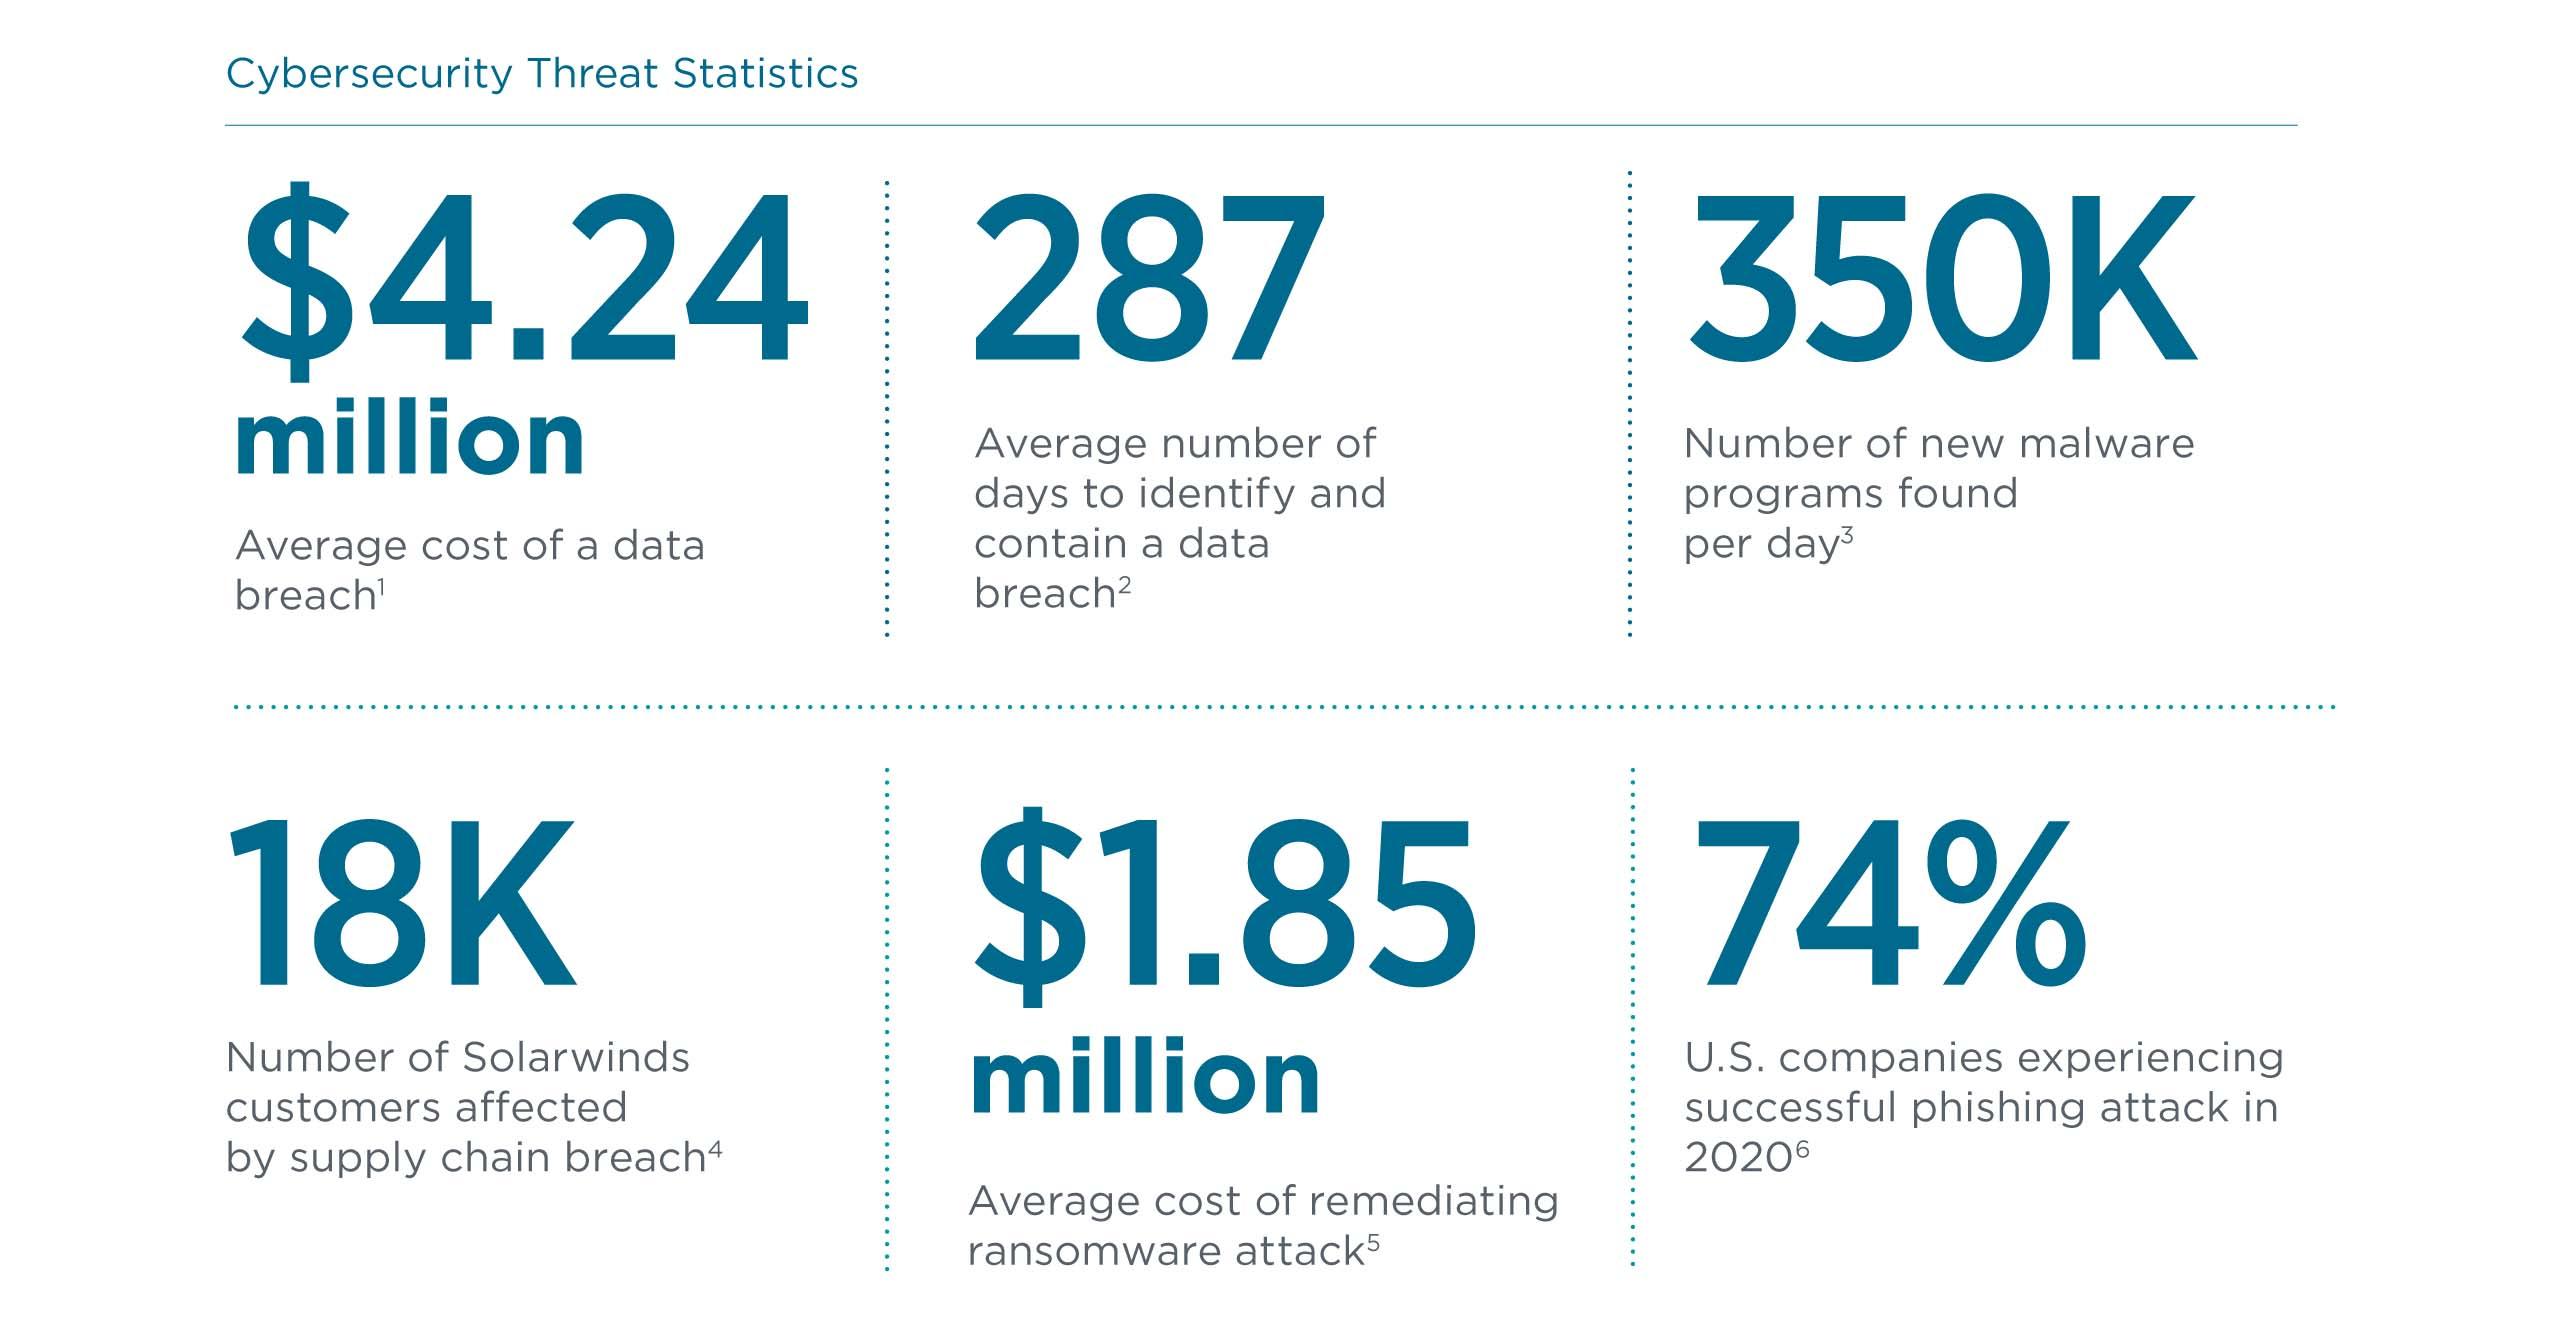 Cybersecurity Threat Statistics